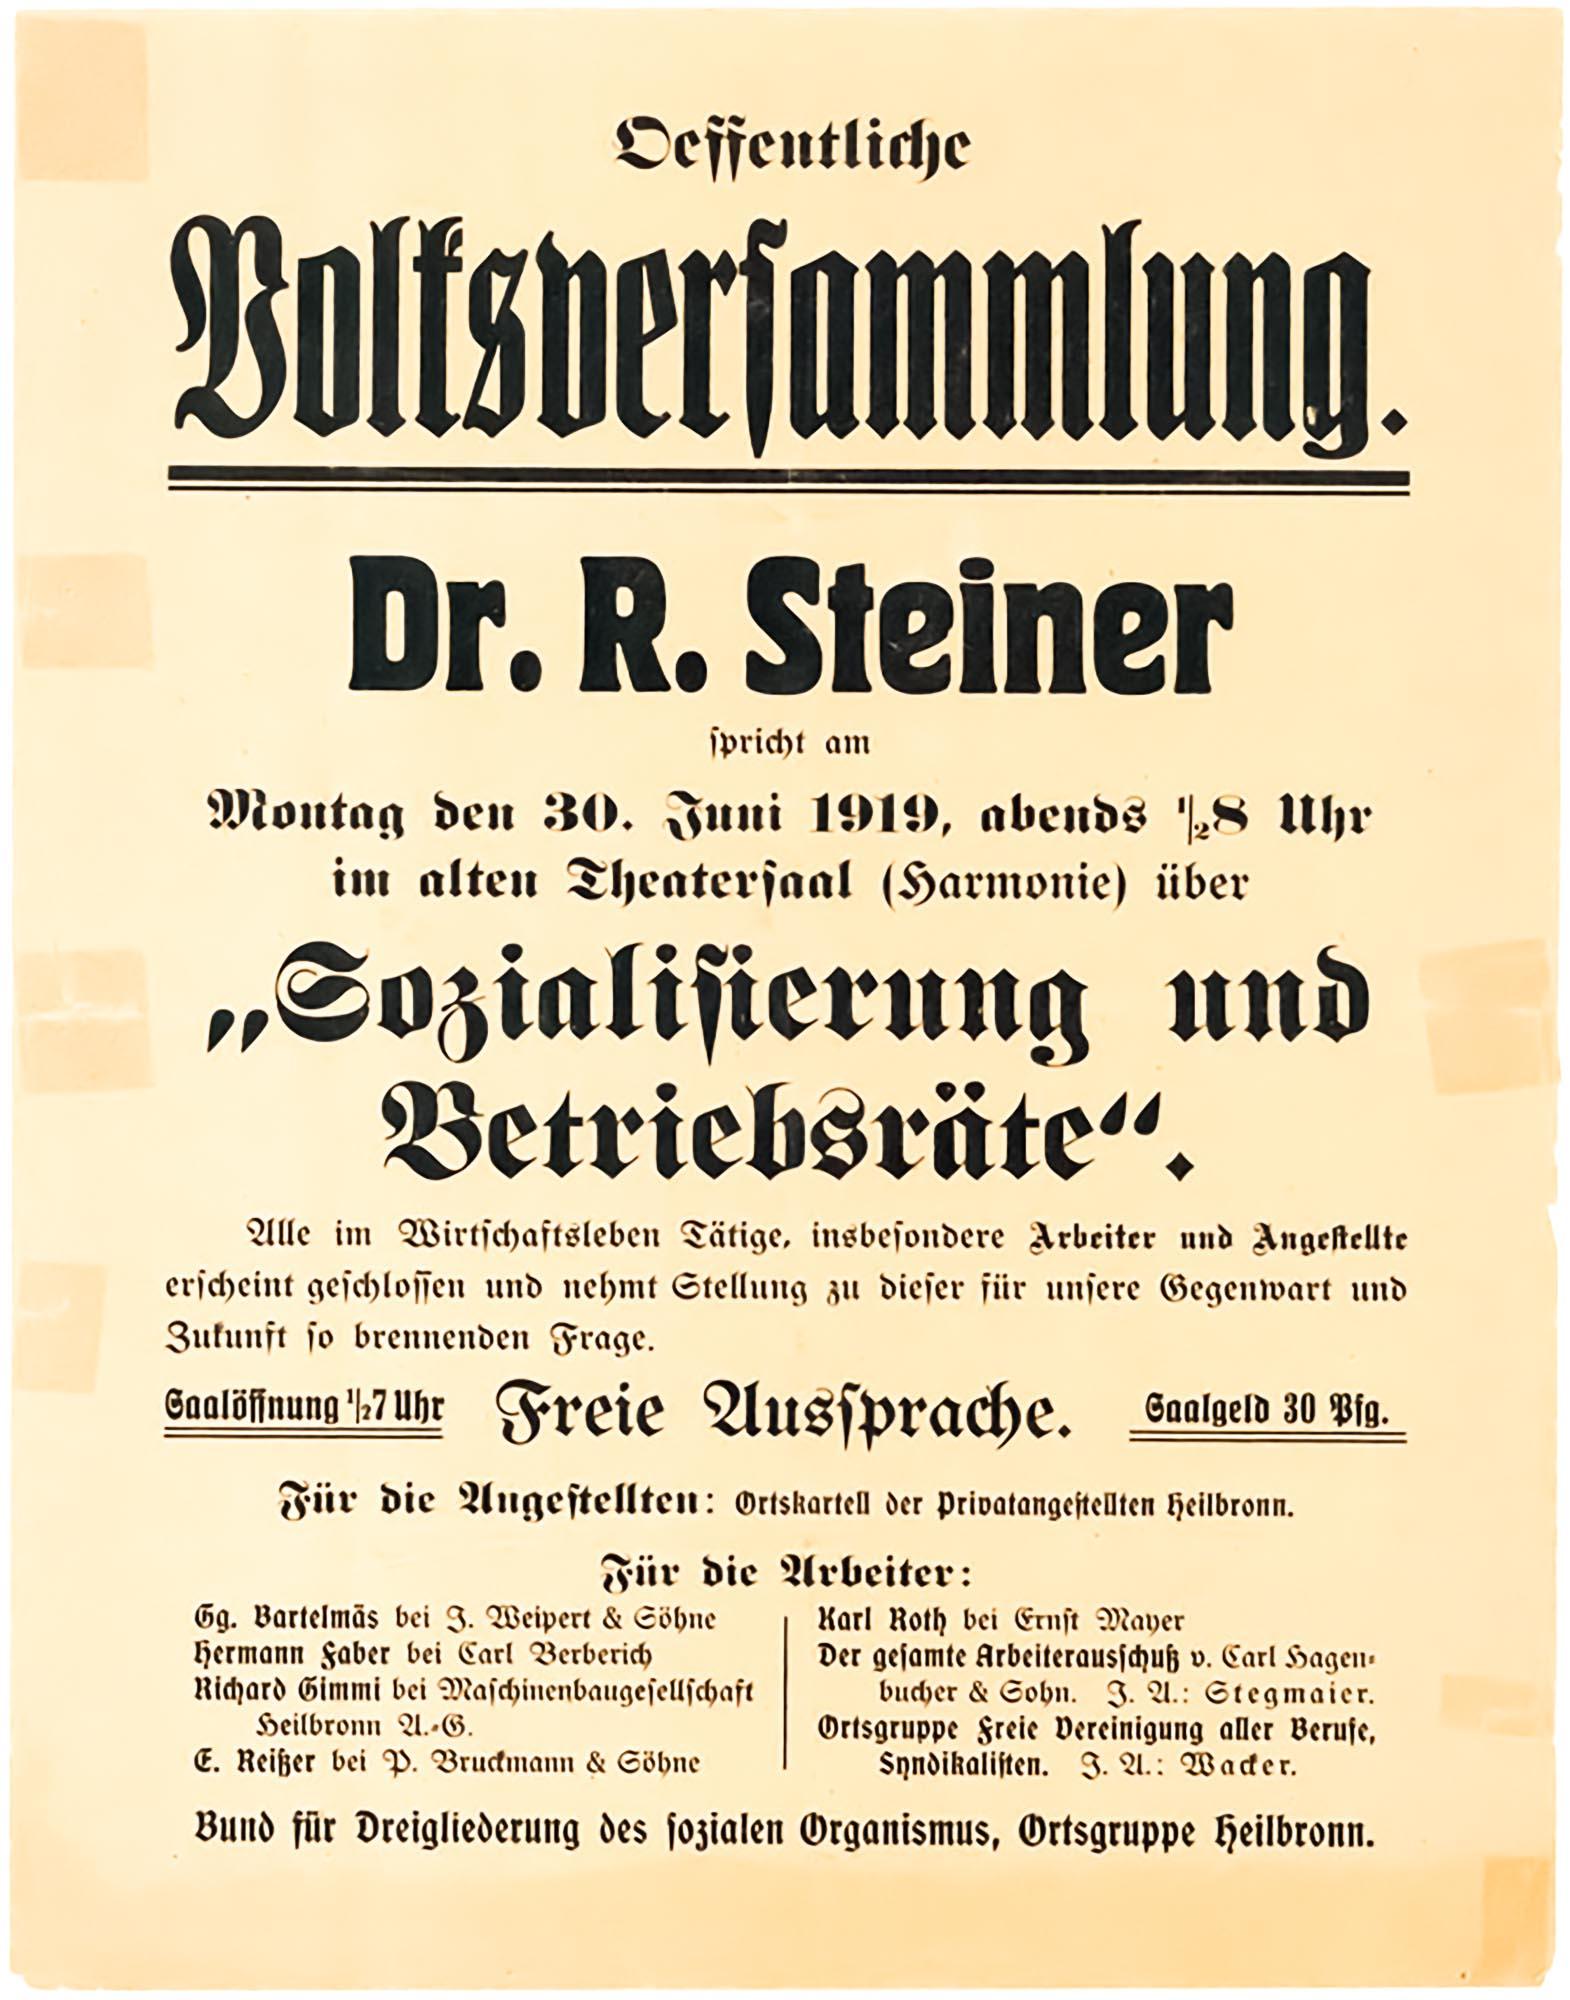 sp2_Dreigliederungspropaganda_1919_ph-3000 x 3821-LR-Jonas.jpg